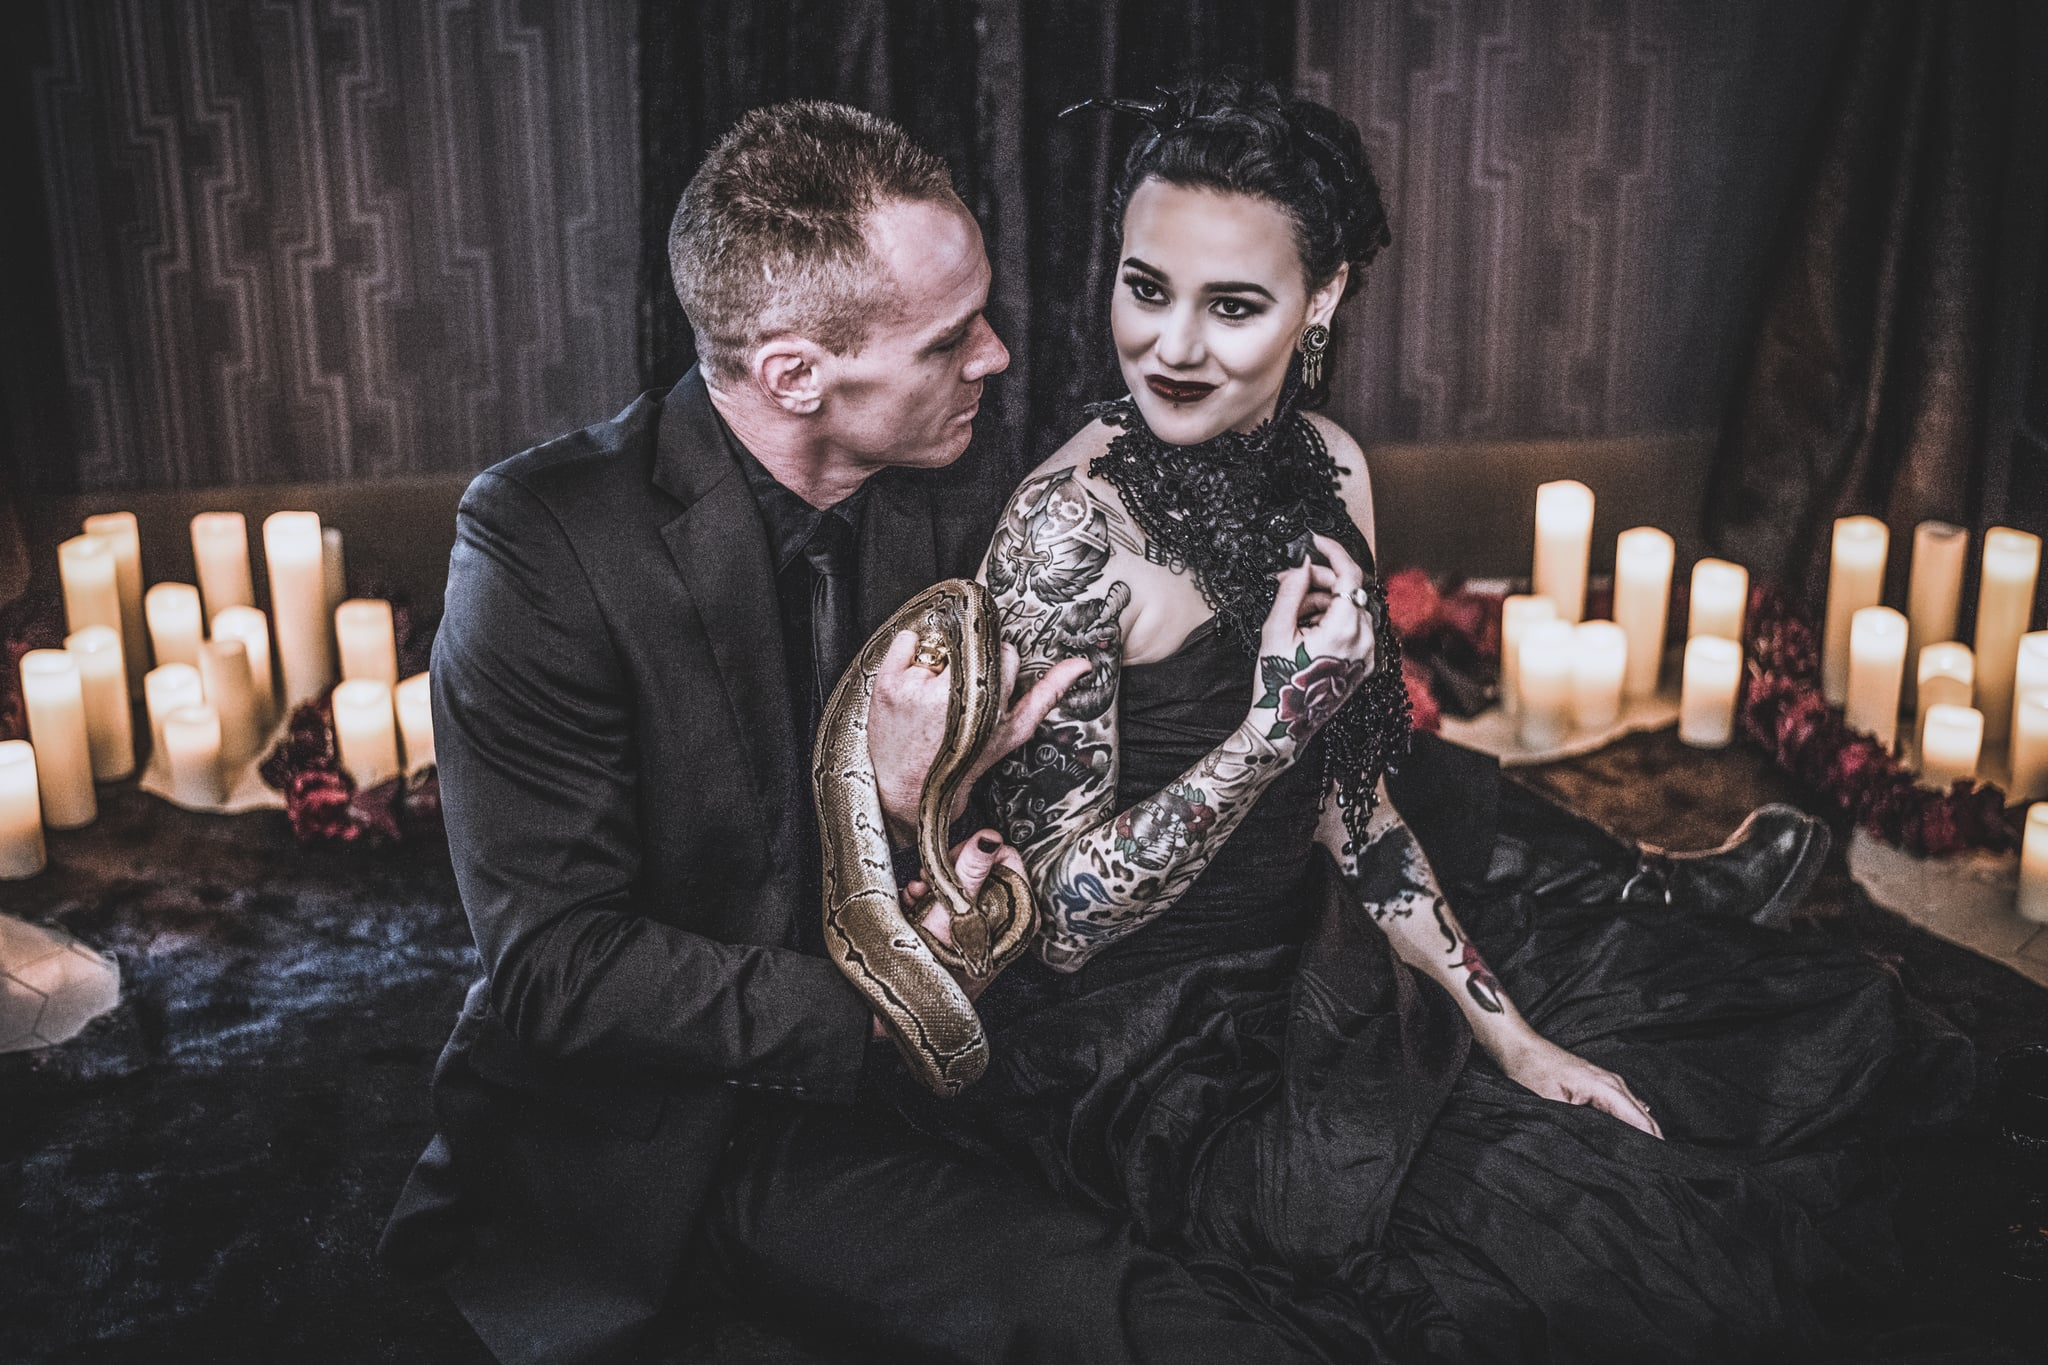 Halloween Goth Wedding Ideas  POPSUGAR Love & Sex